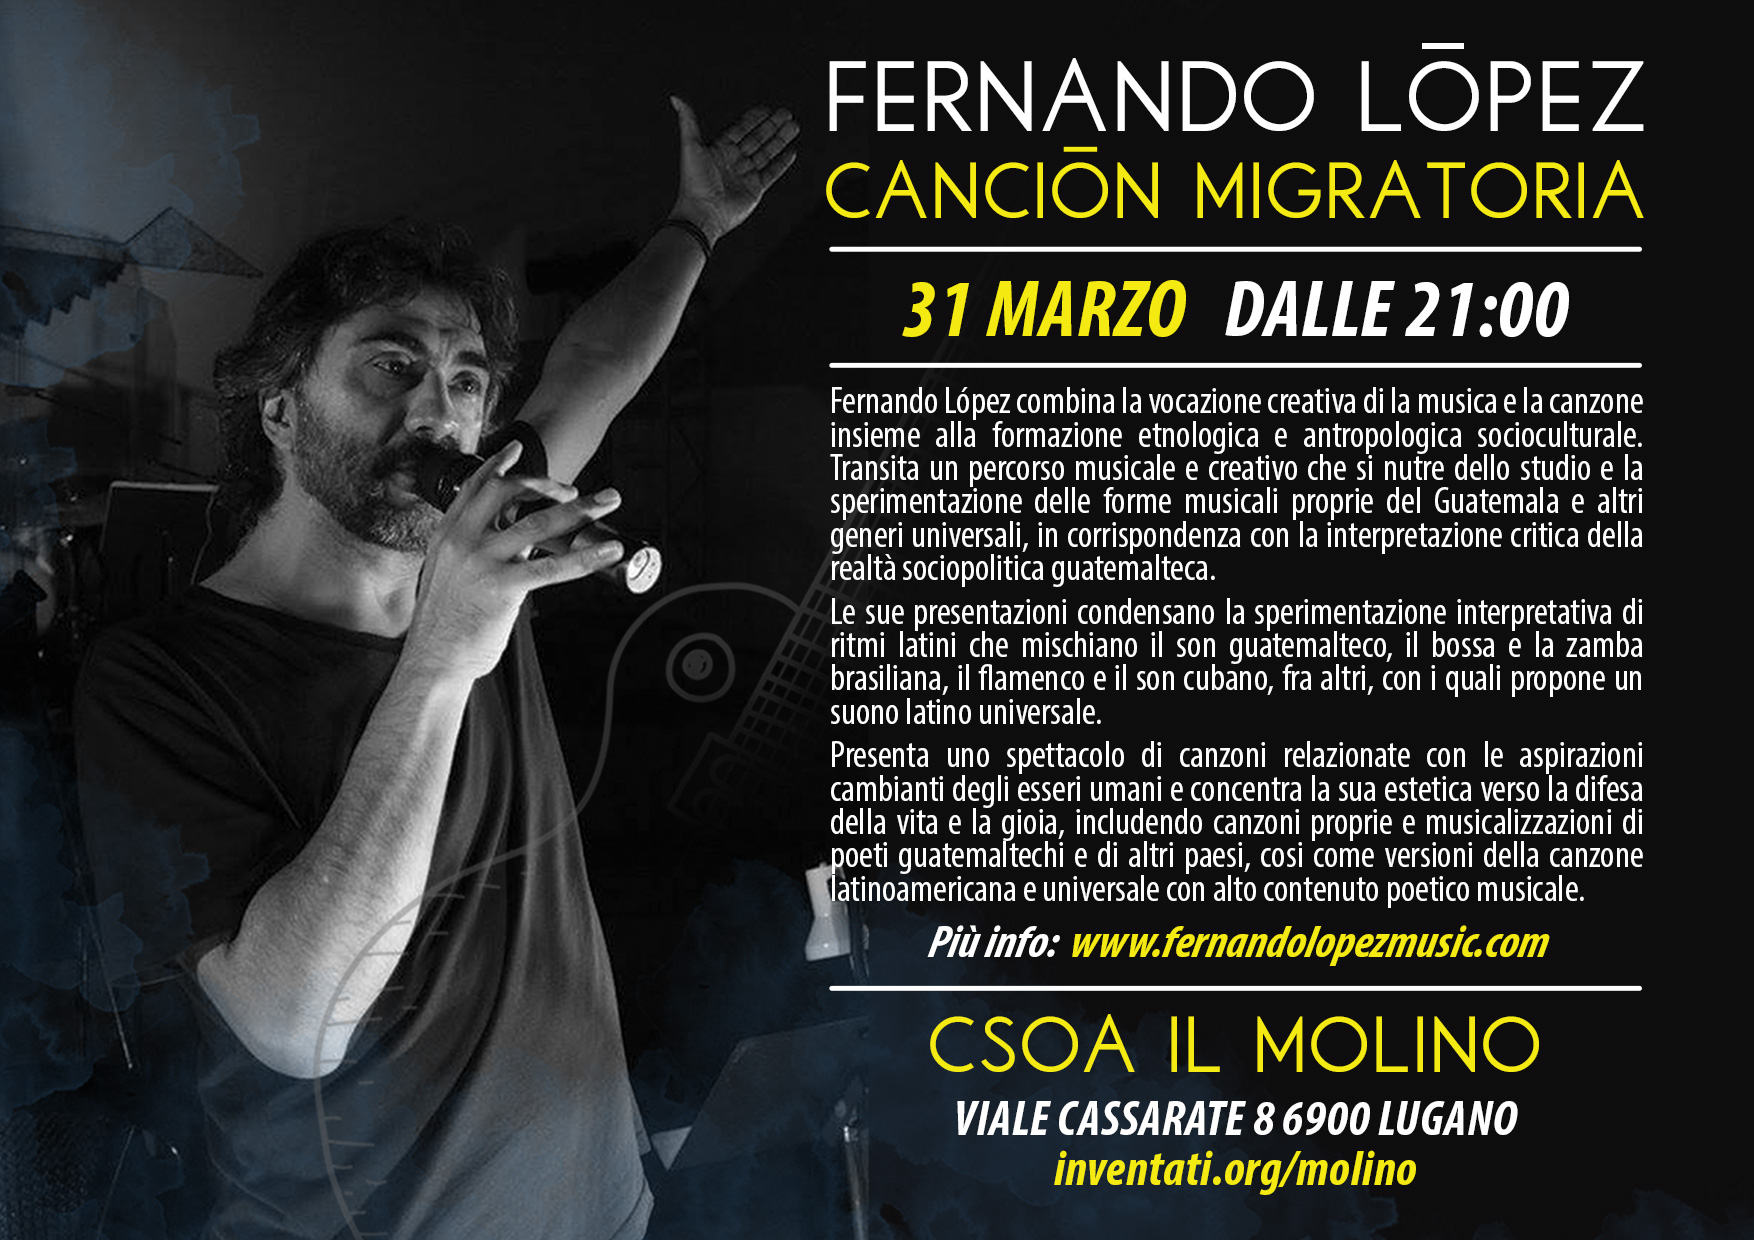 31.03.2017 - Fernando López - Canción Migratoria